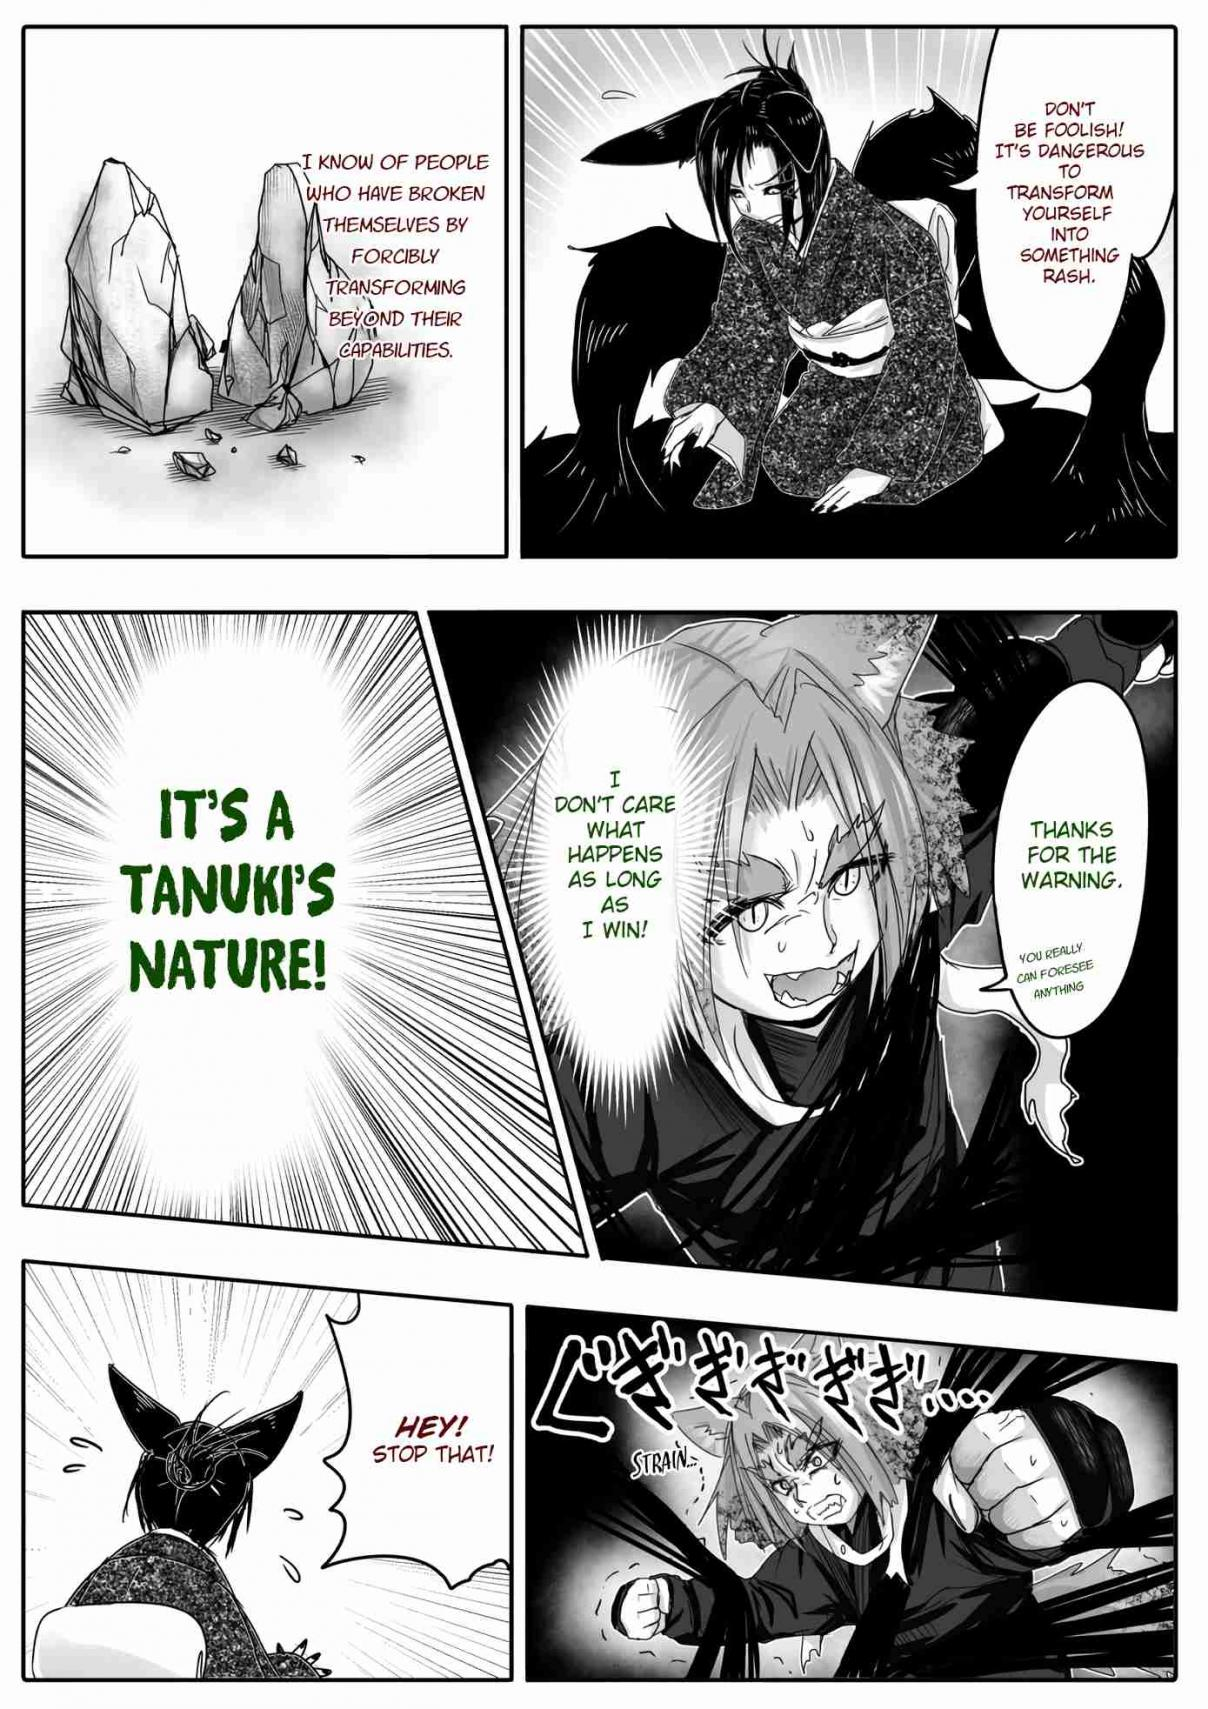 https://img2.nineanime.com/comics/pic3/7/22087/1489975/c66f4400c66259105a6f2cda99cc5f41.jpg Page 1